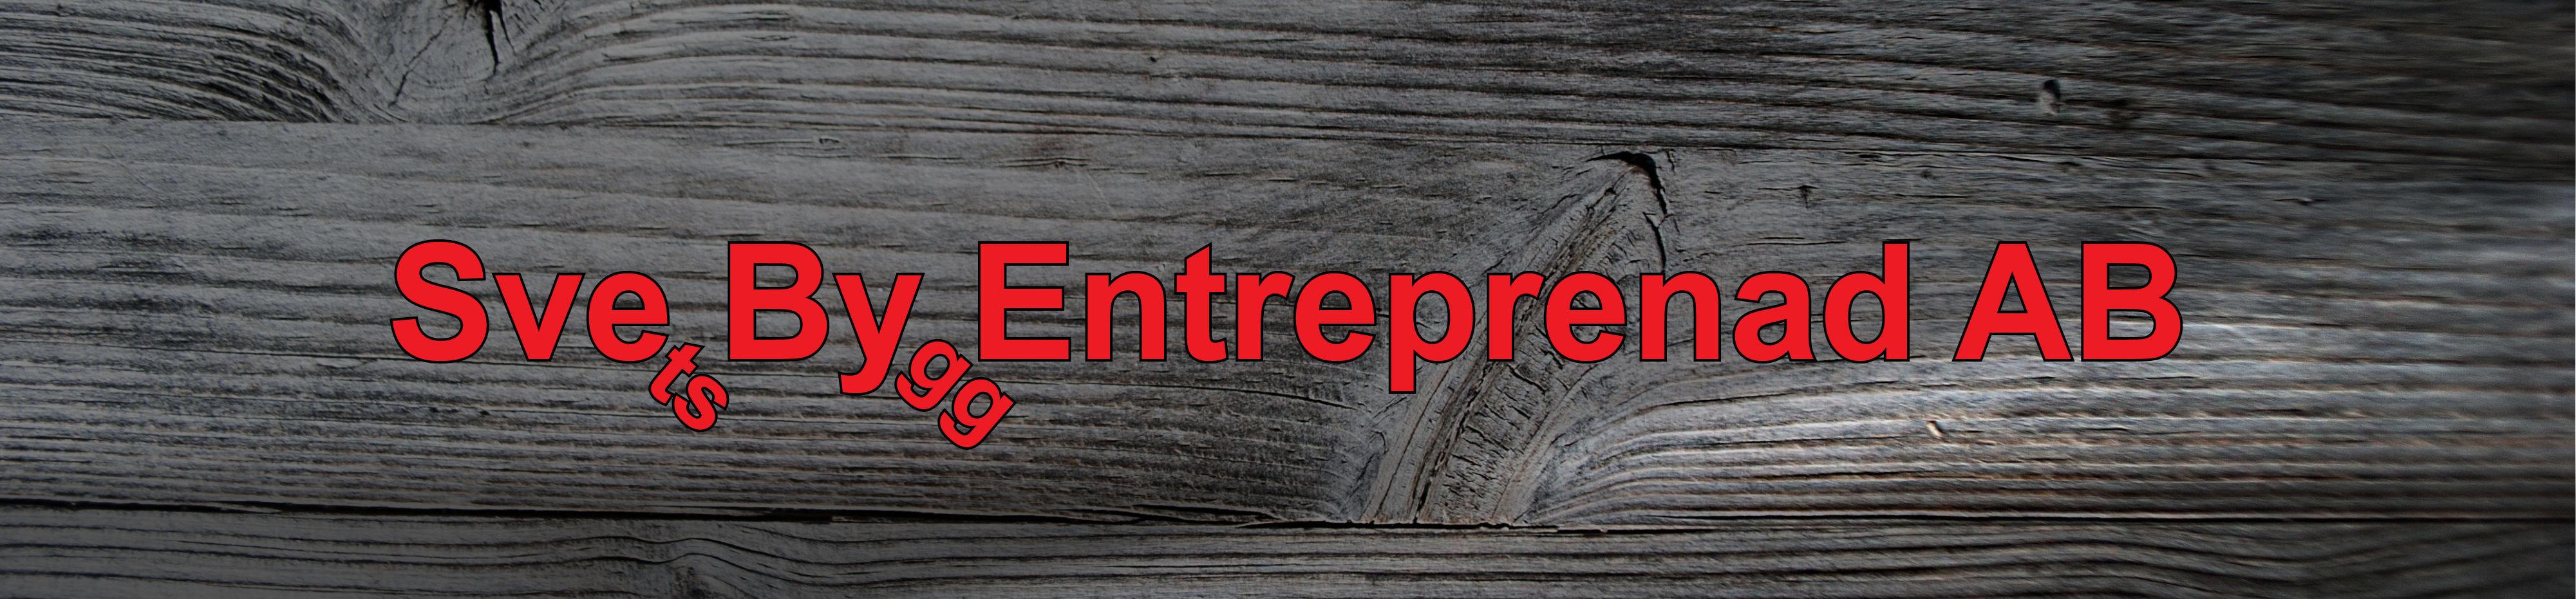 Sveby Entreprenad AB